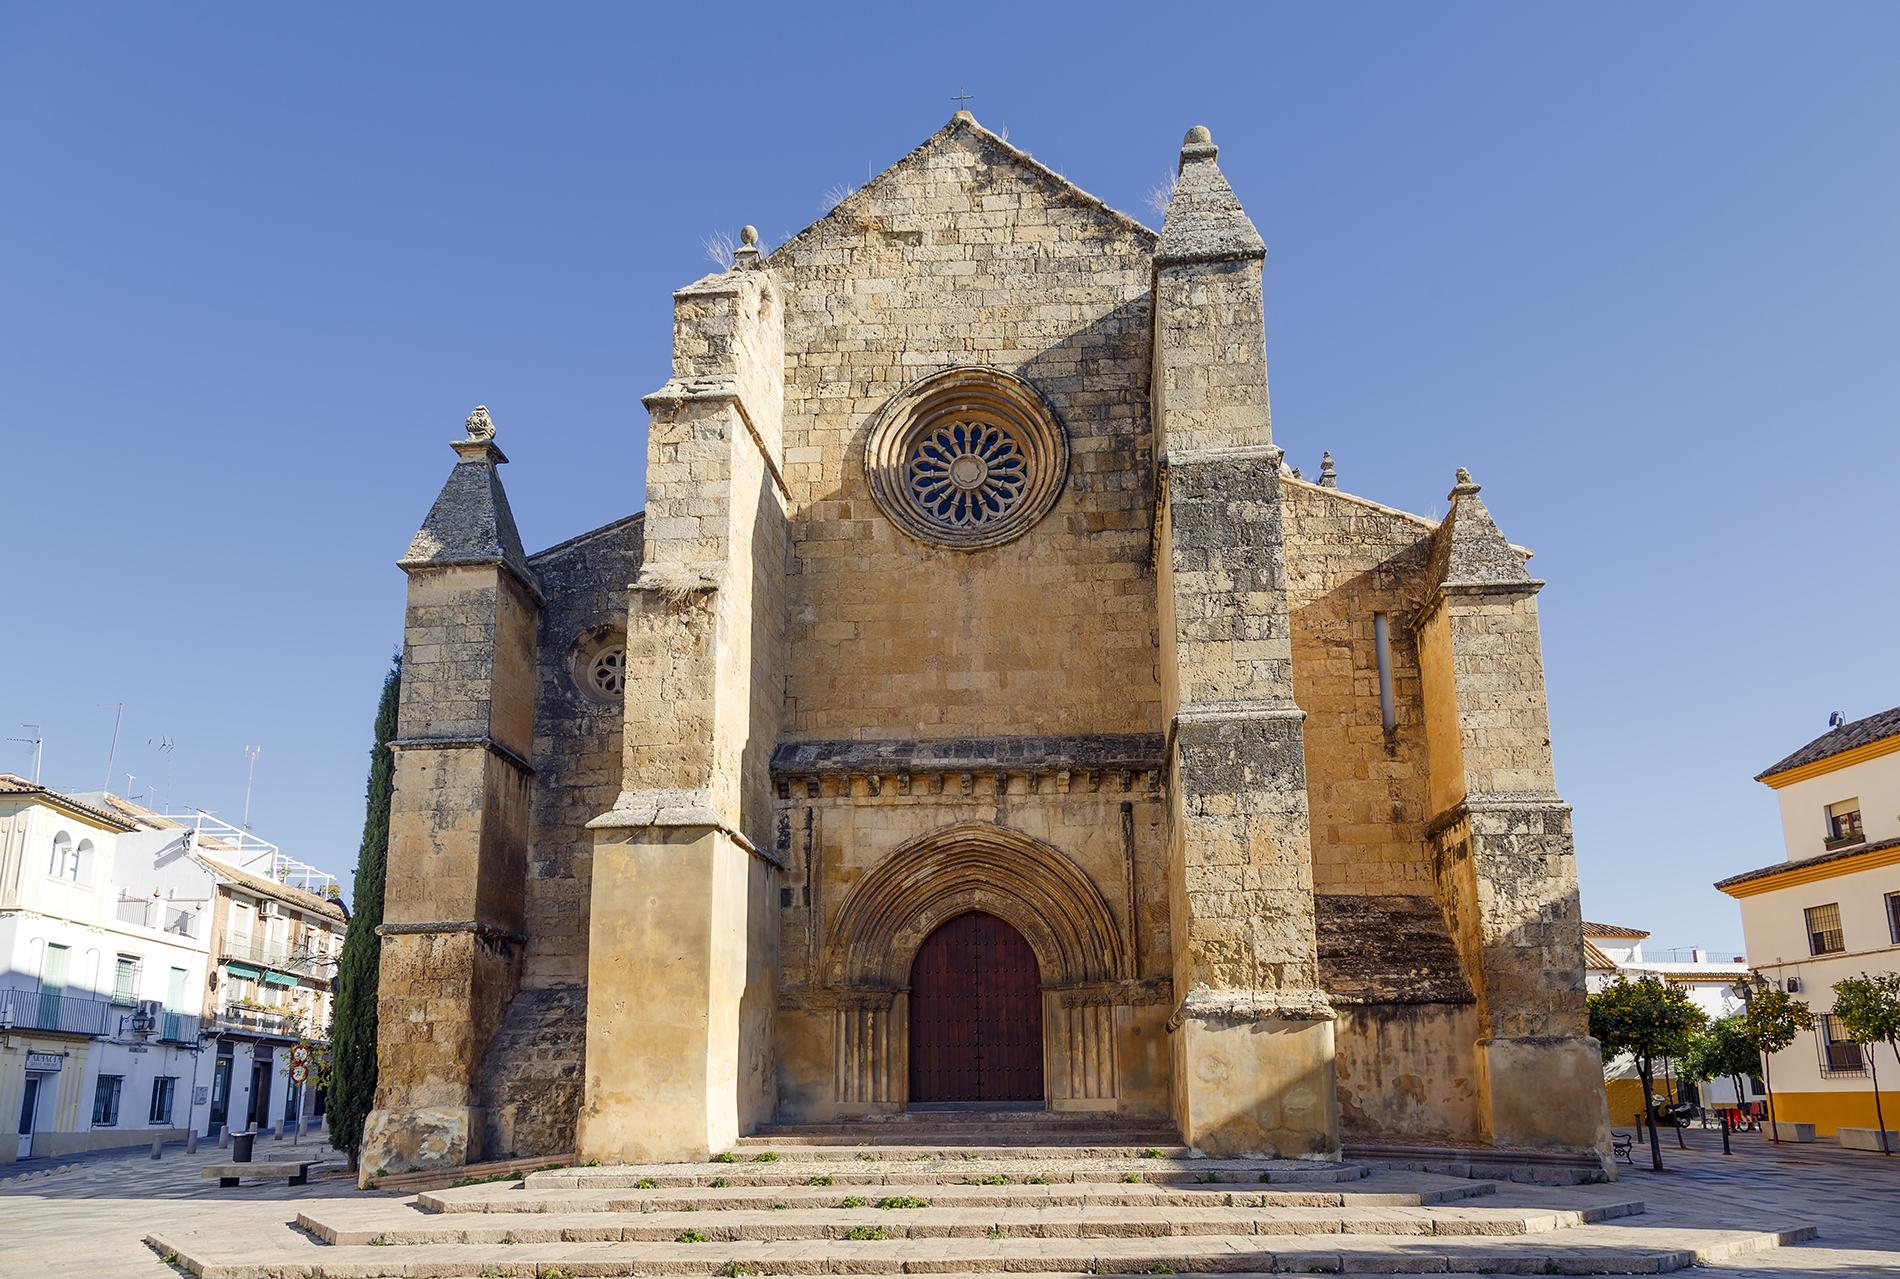 Qué ver en Córdoba - Iglesia de Santa Marina | Foto:  Carlos Soler | Dreamstime.com